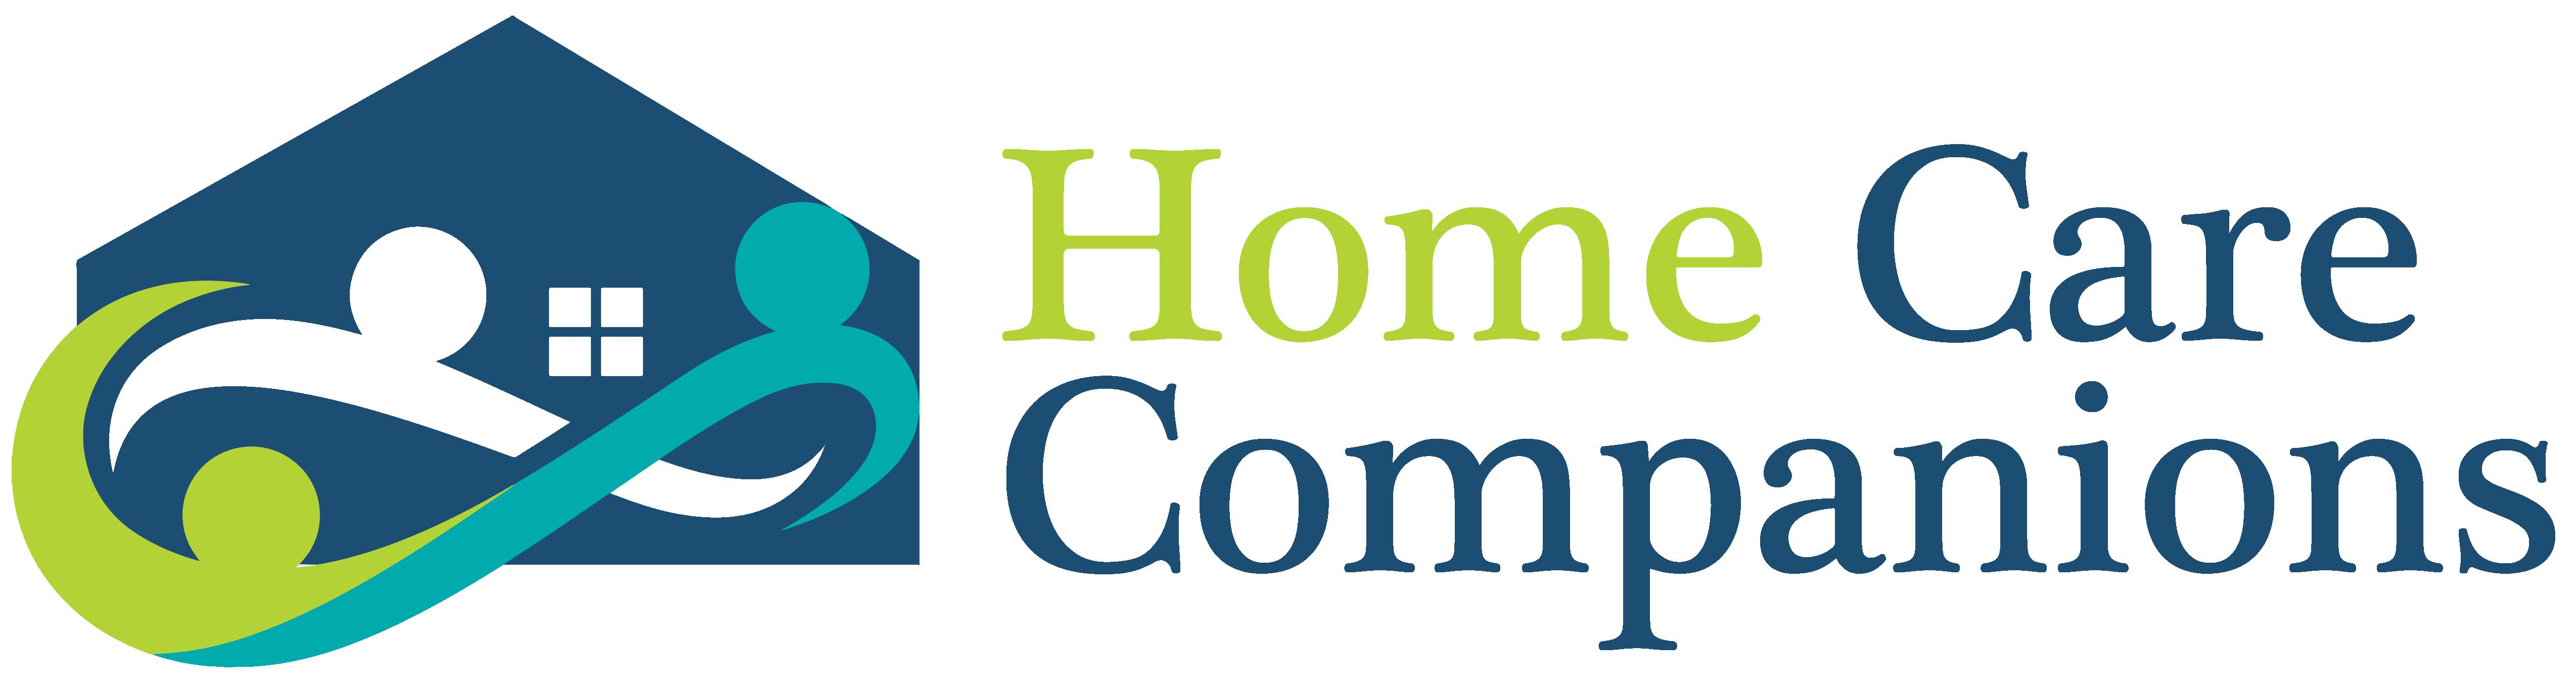 Home Care Companions